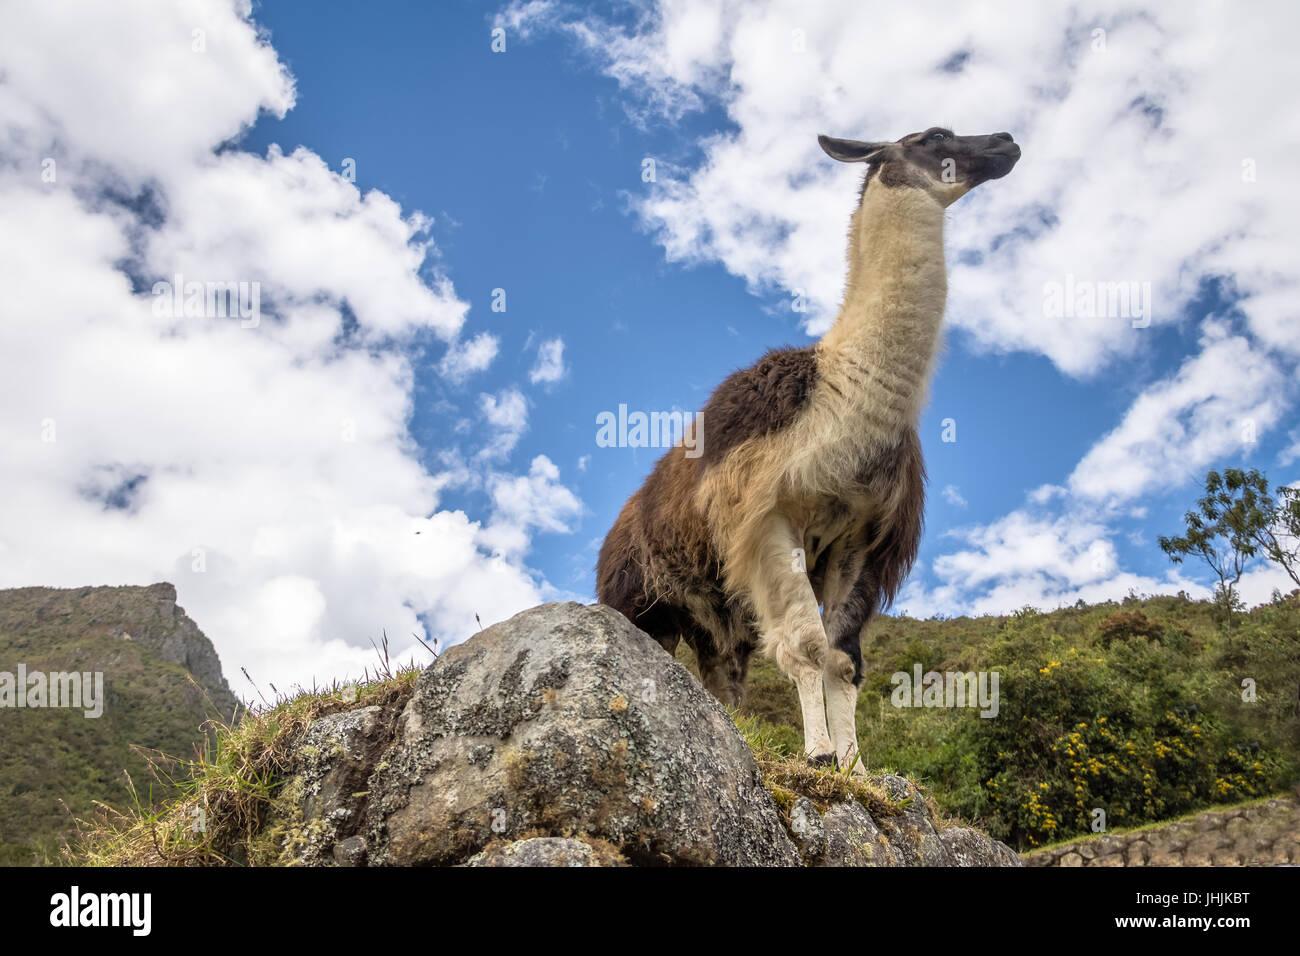 Lamas auf Inkaruinen Machu Picchu - Heiliges Tal, Peru Stockbild